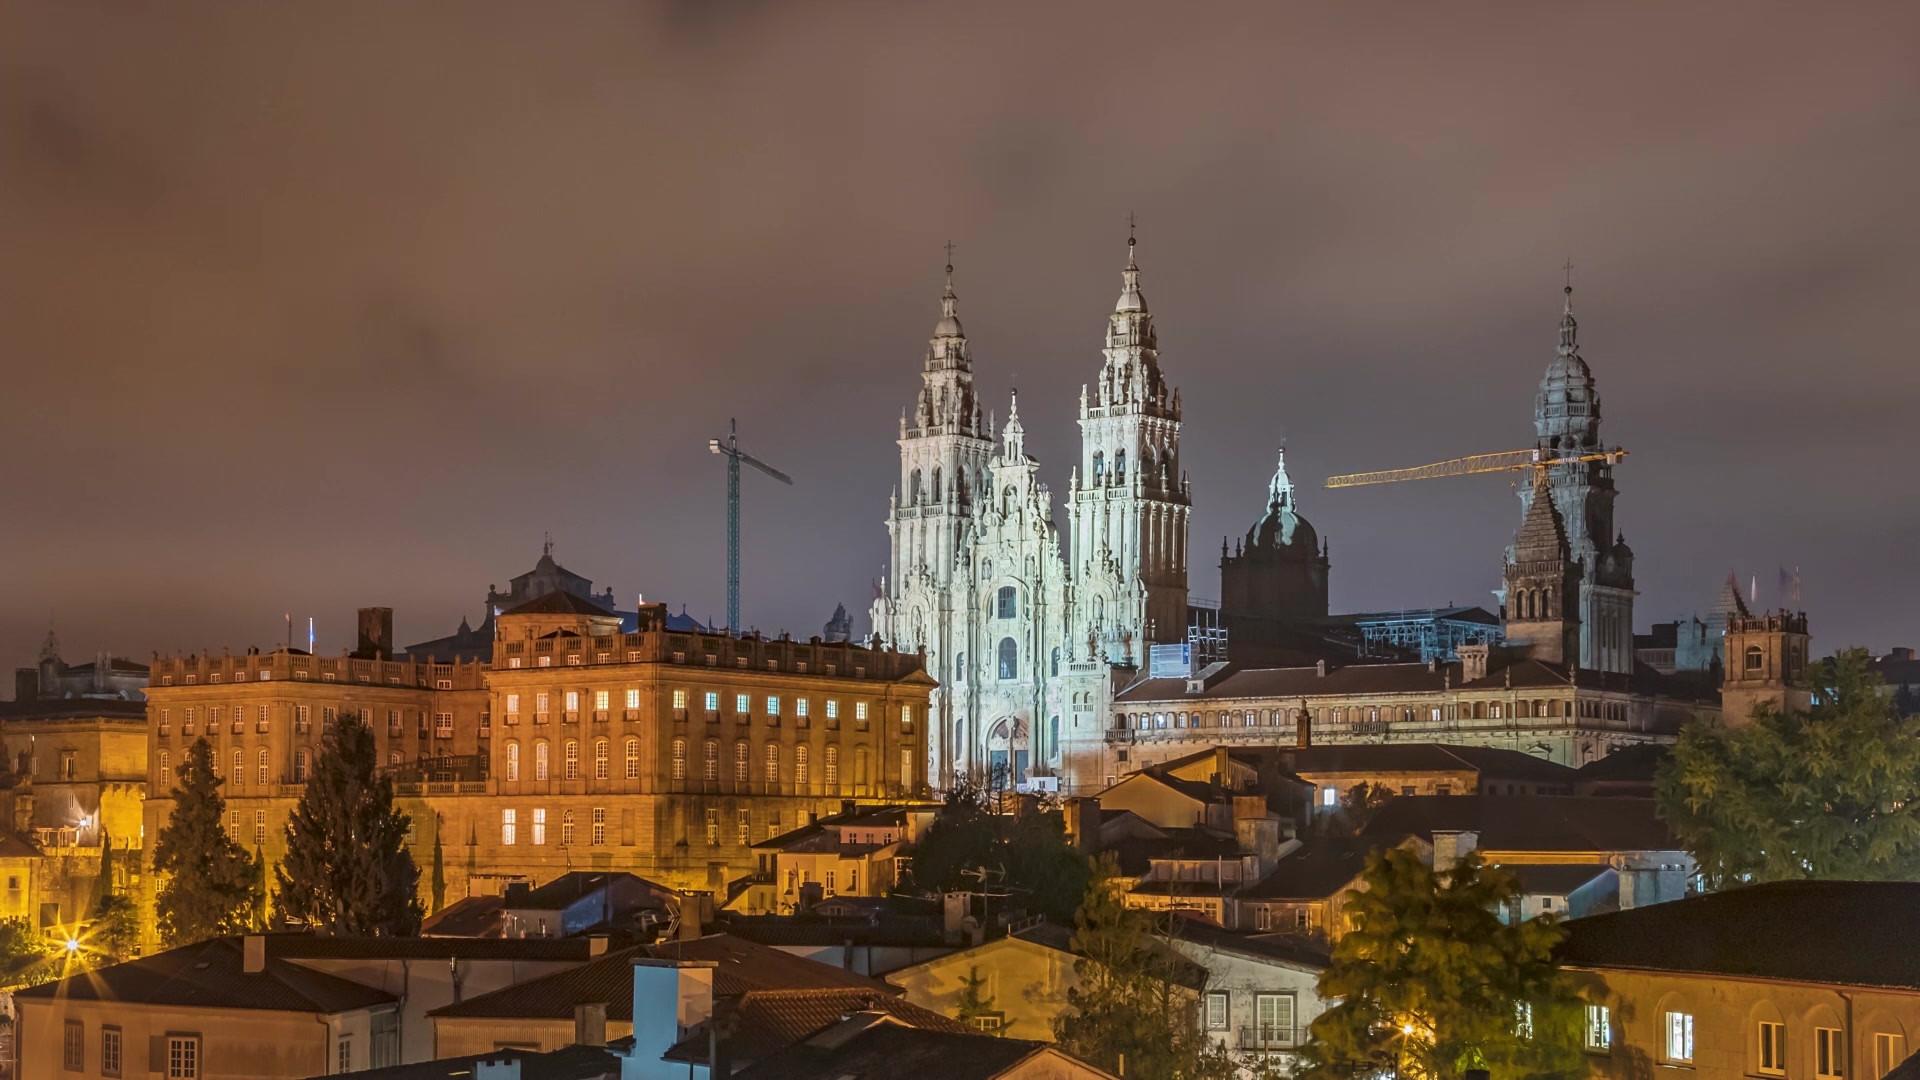 Santiago de Compostela - October 9, 2020